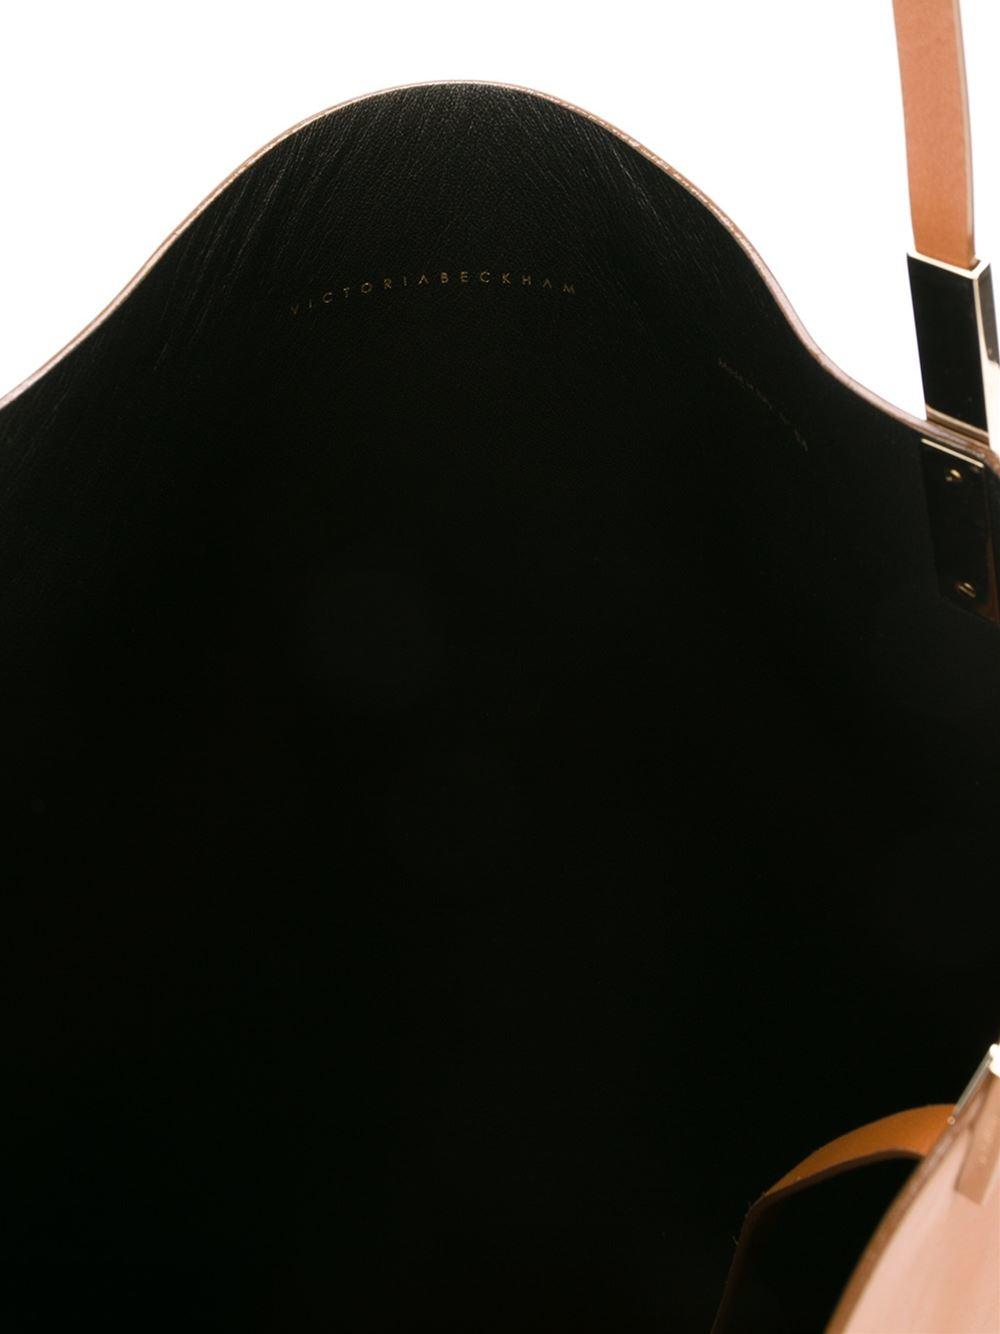 Victoria Beckham Trapeze Tote in Brown